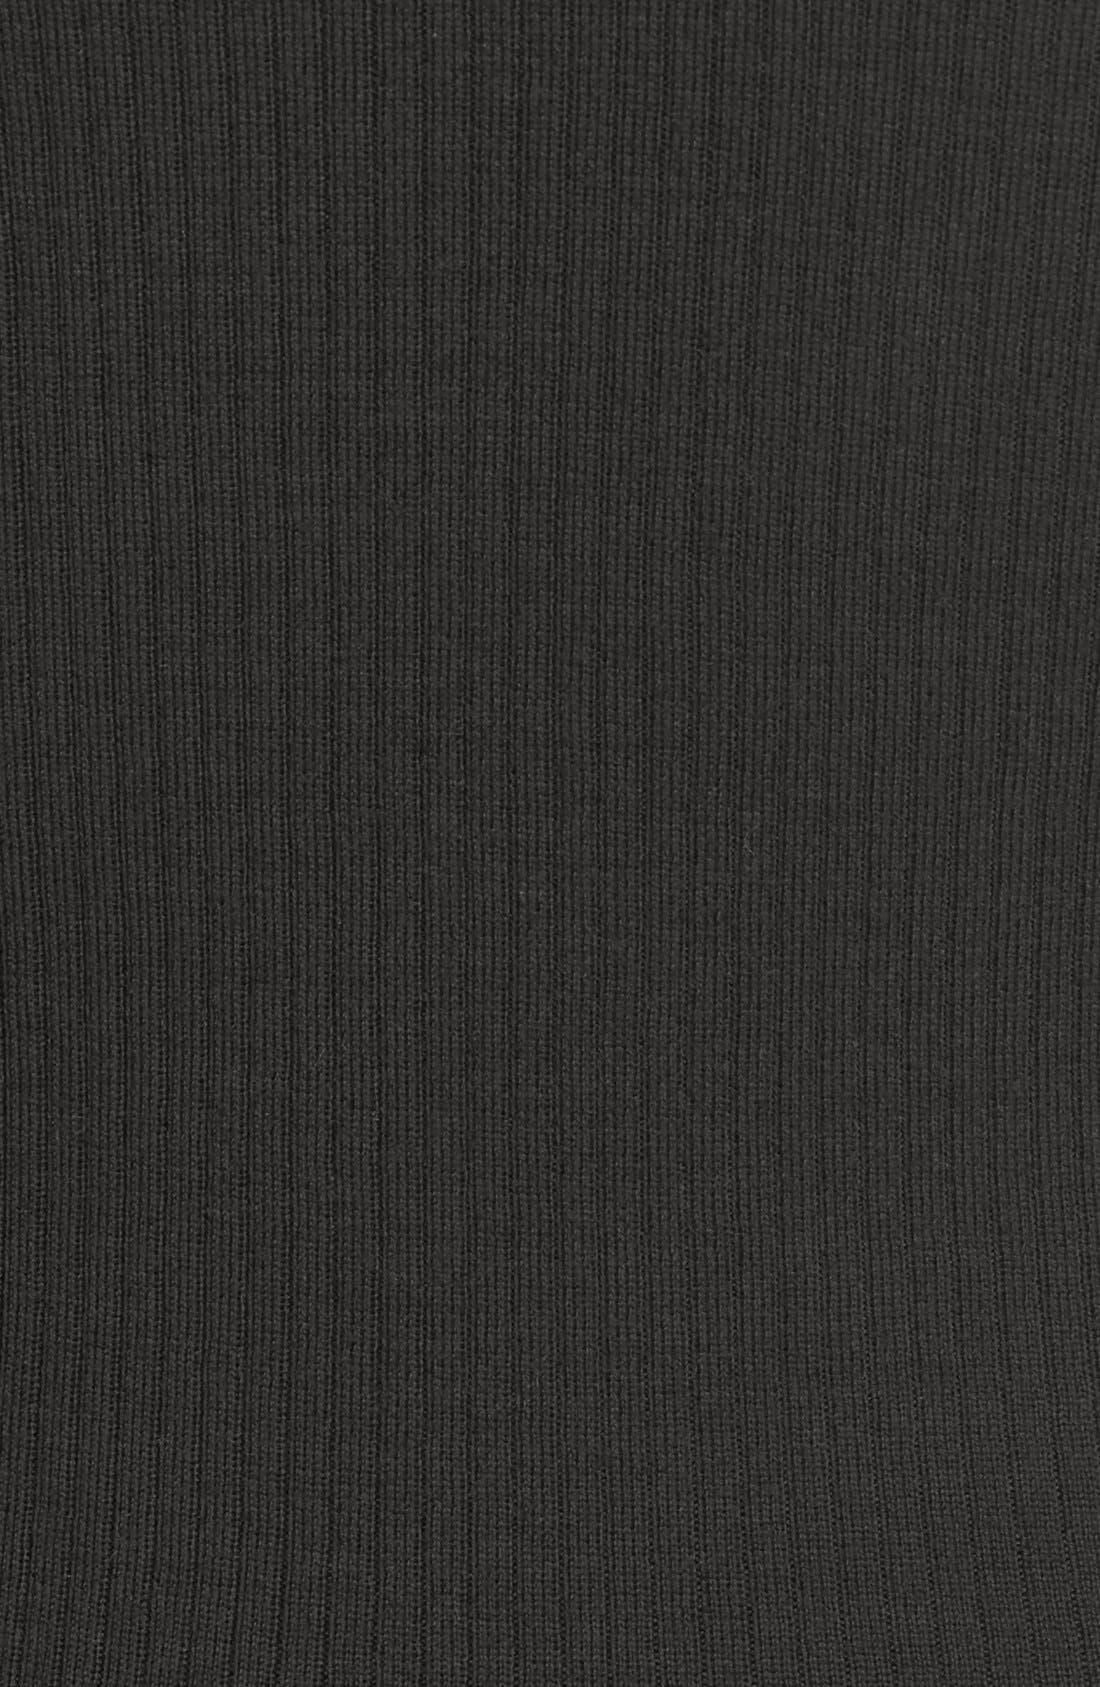 'Mirzi' Rib Knit Merino Wool Sweater,                             Alternate thumbnail 5, color,                             363